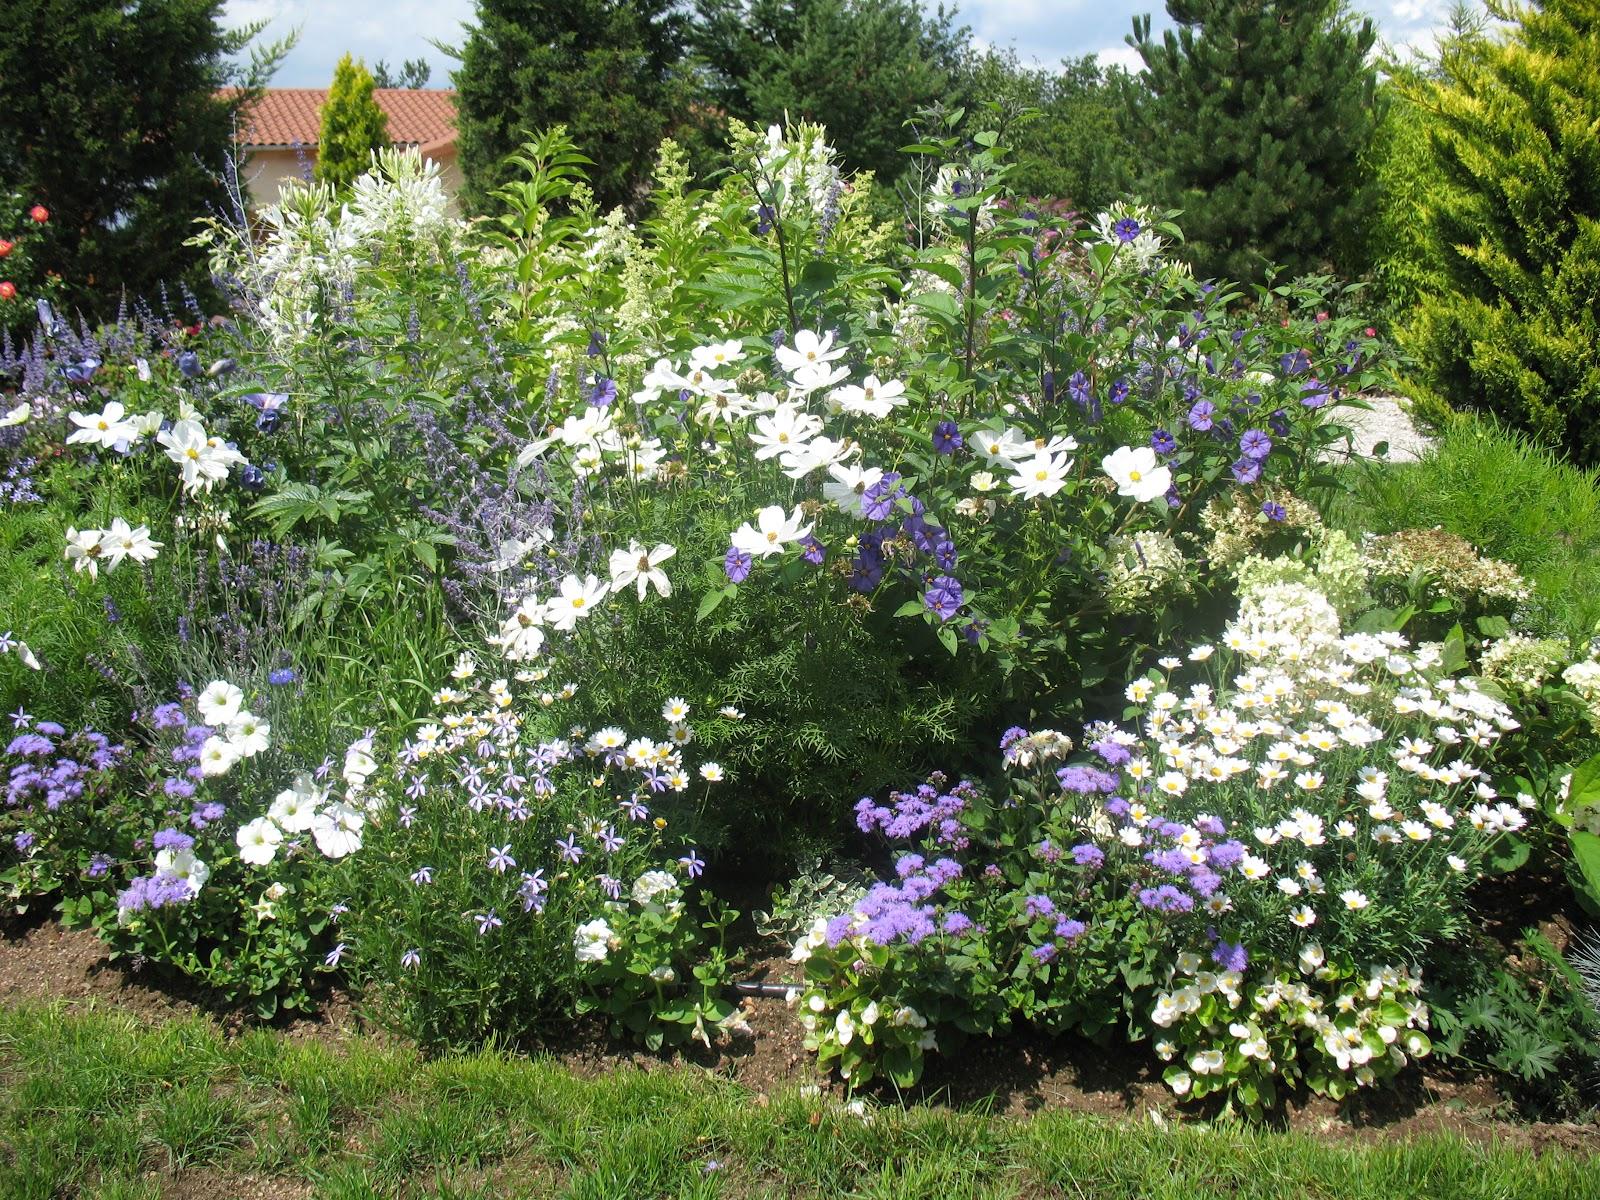 Roses du jardin Chªneland Anthémis ou Argyranthemum Frutescens